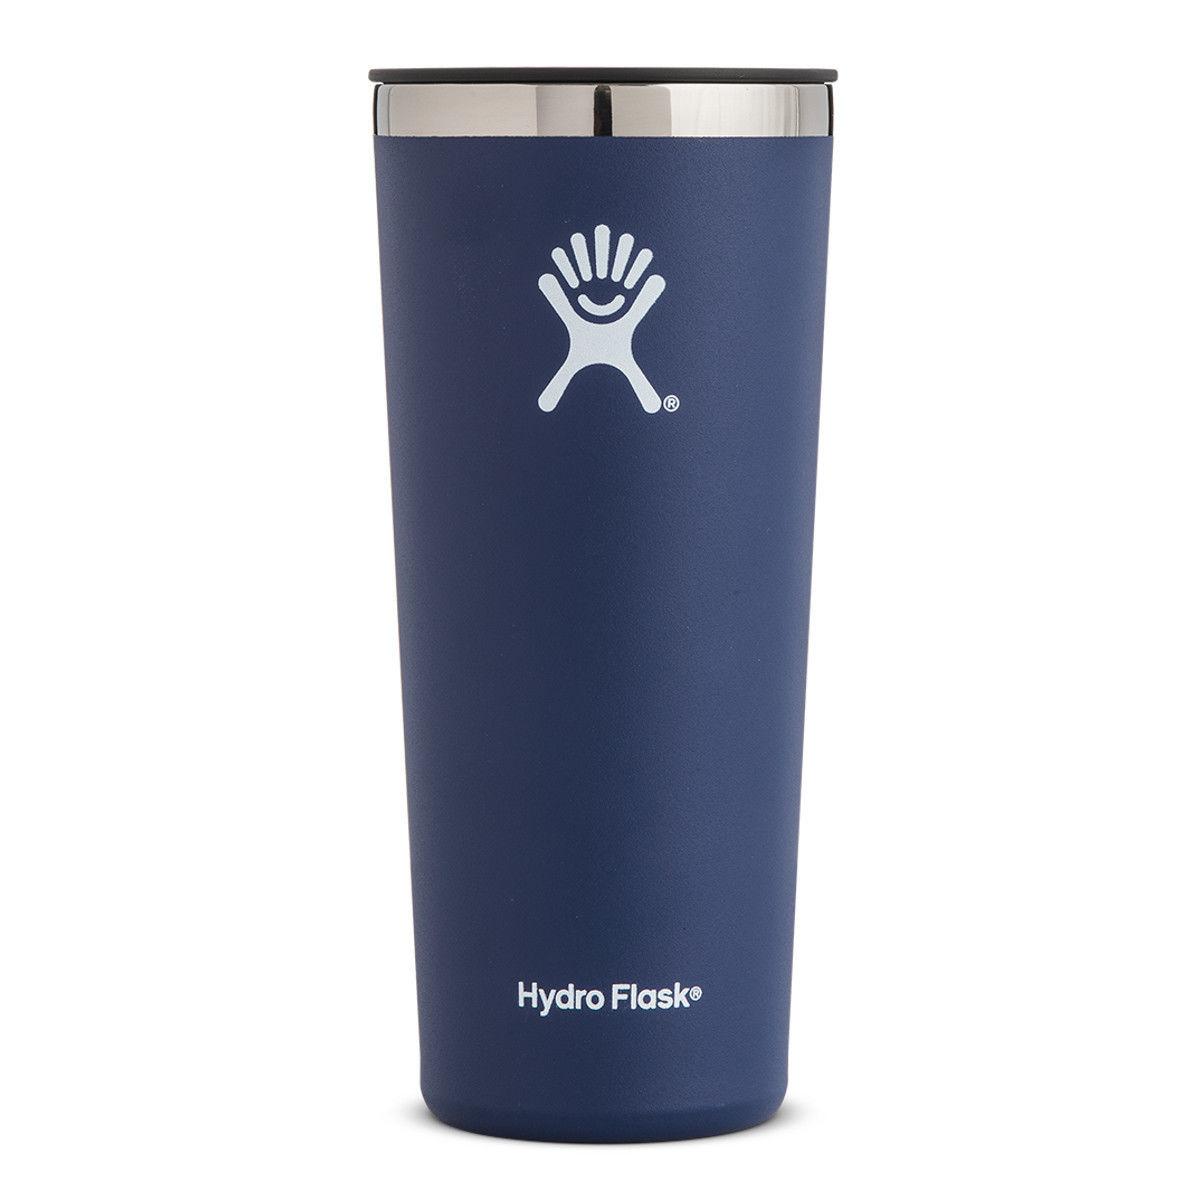 Hydro Flask 22 Oz. Tumbler